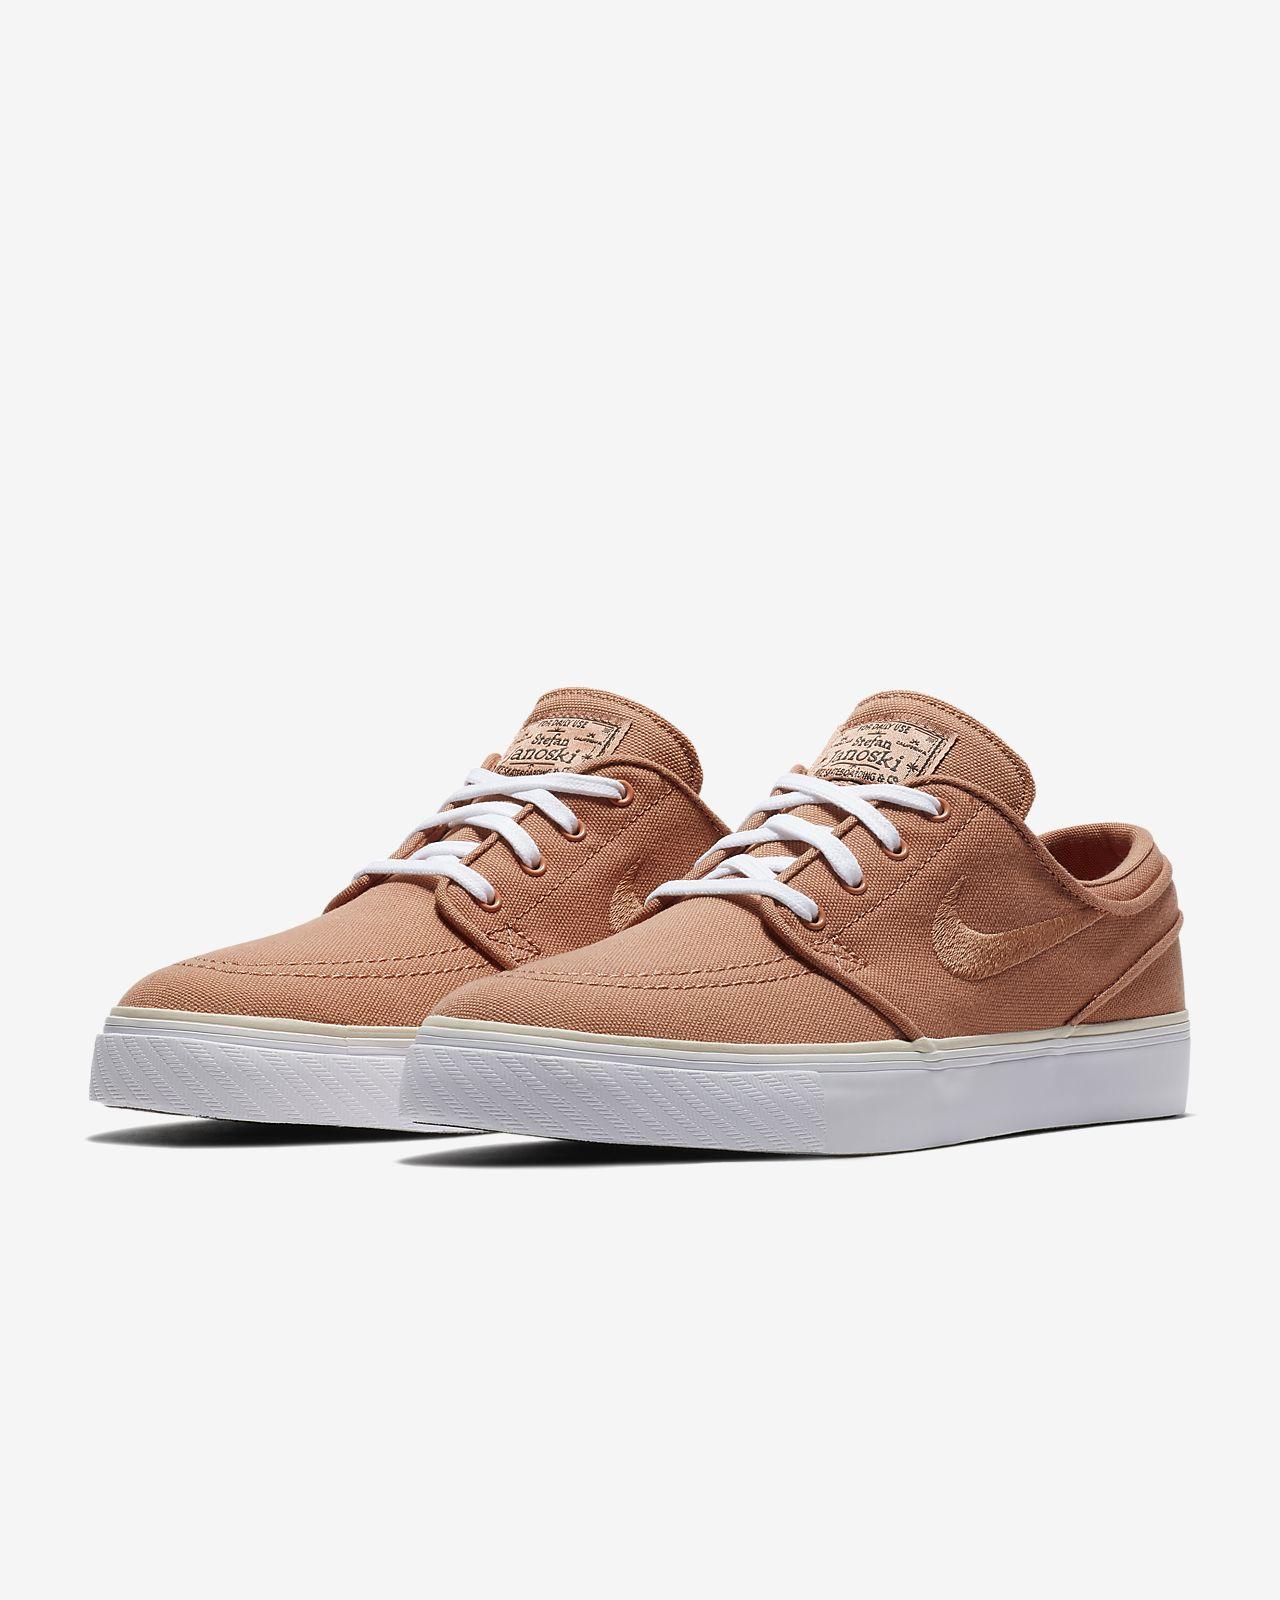 big sale 5b7f6 50db3 ... Nike SB Zoom Stefan Janoski Canvas Women s Skate Shoe